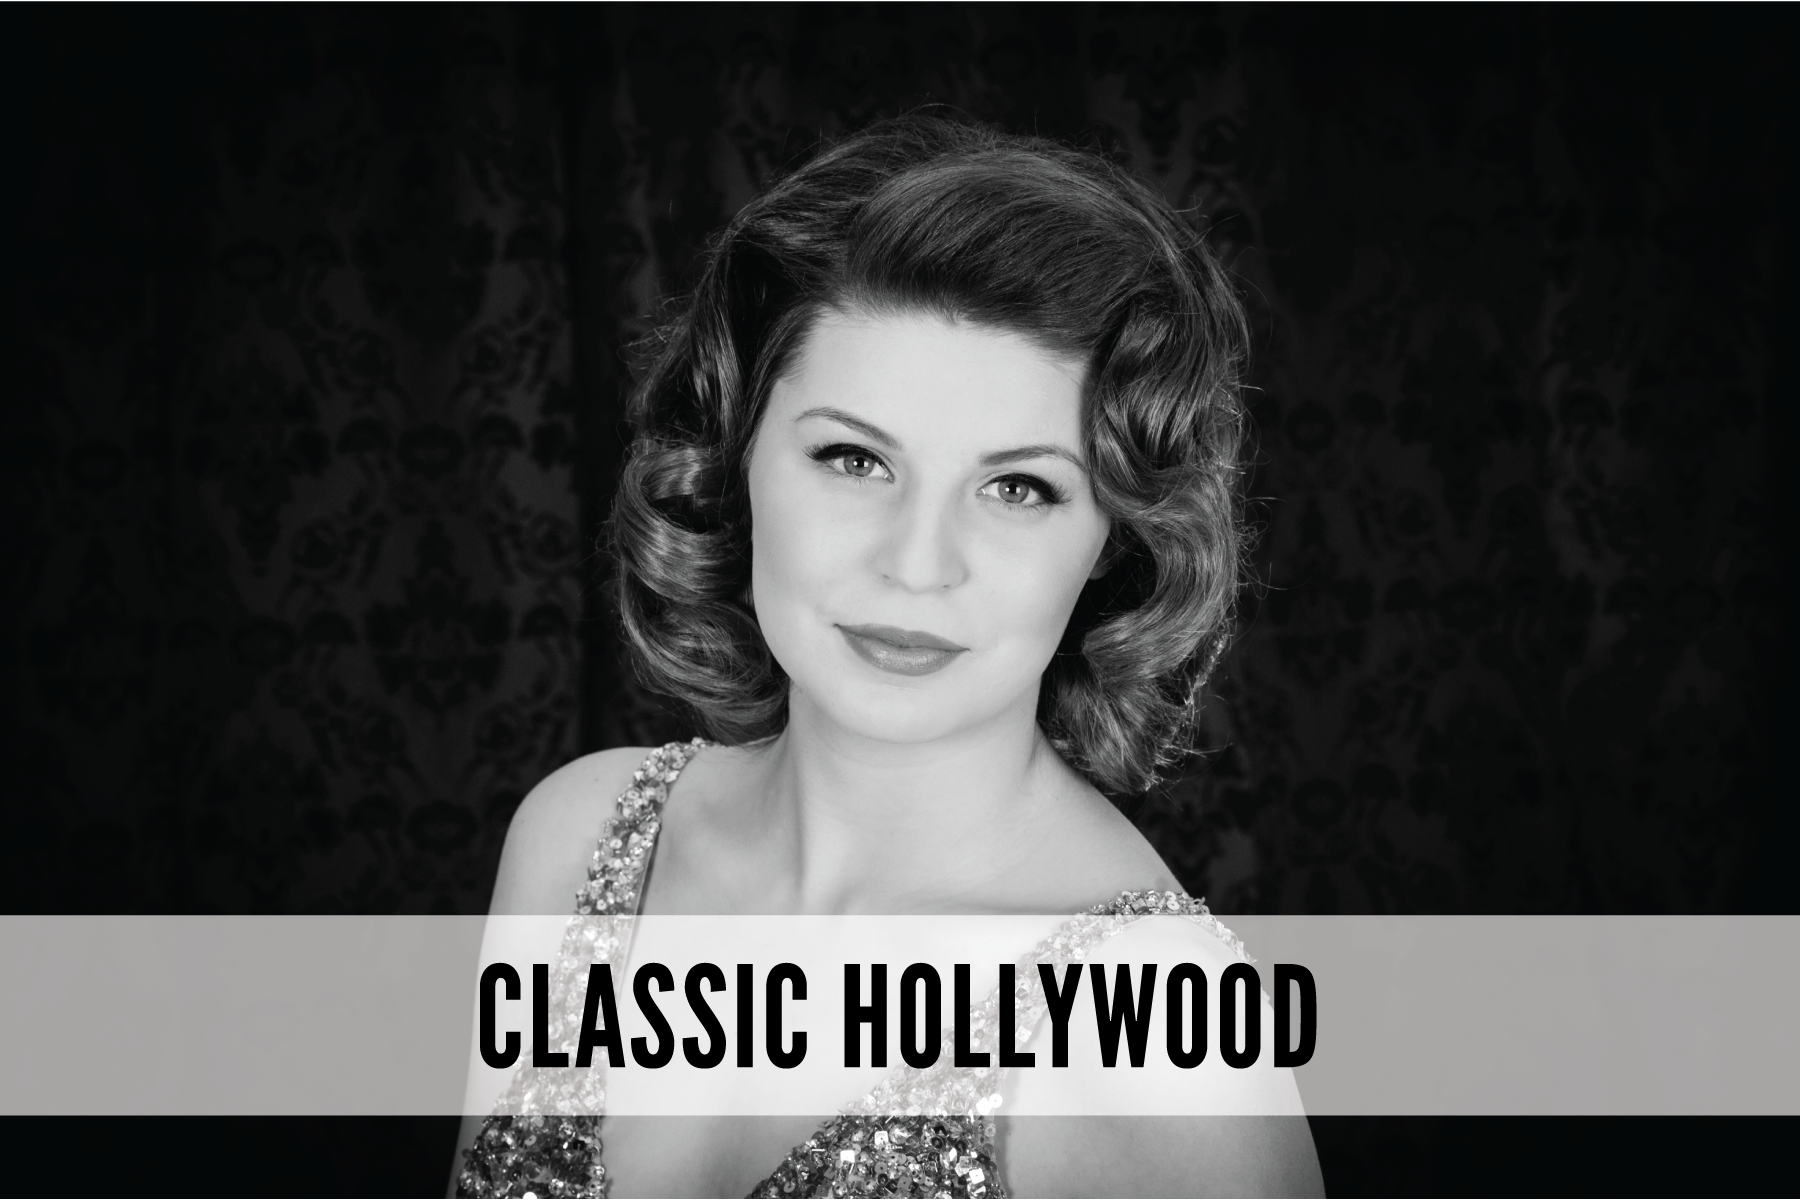 brett-dorrian-classic-hollywood-hair-and-makeup